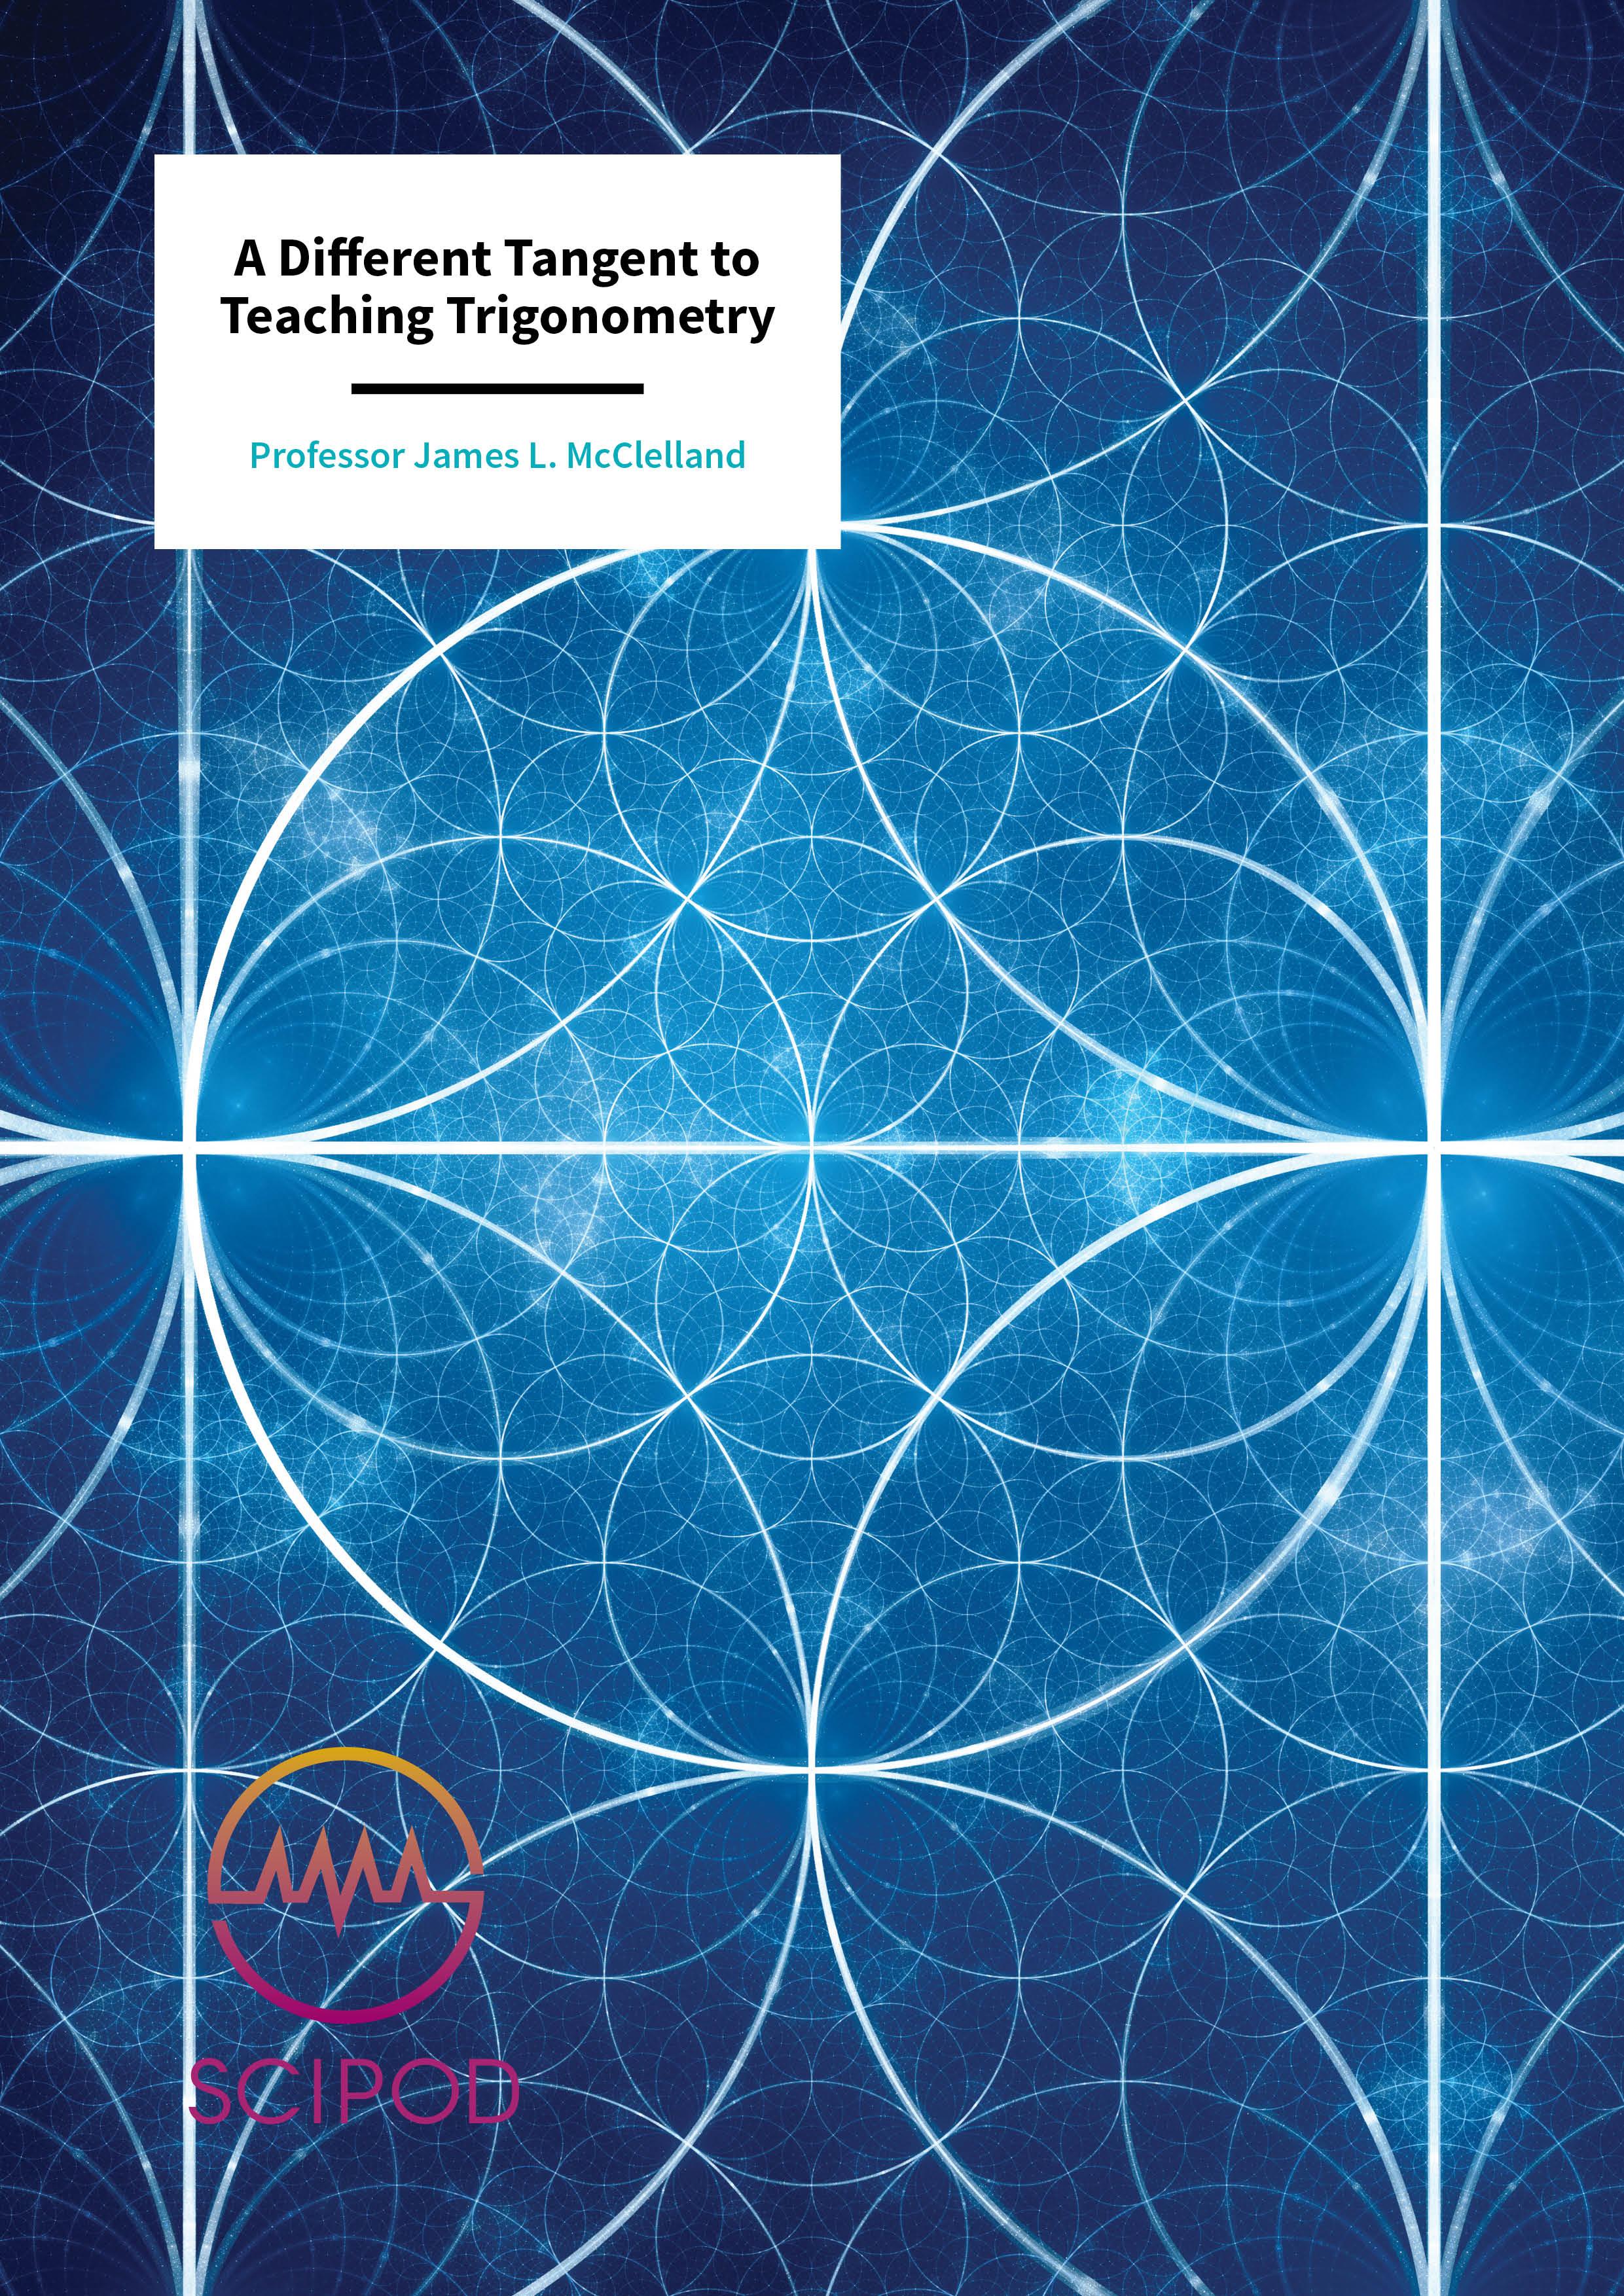 A Different Tangent to Teaching Trigonometry – Professor James L. McClelland, Stanford University